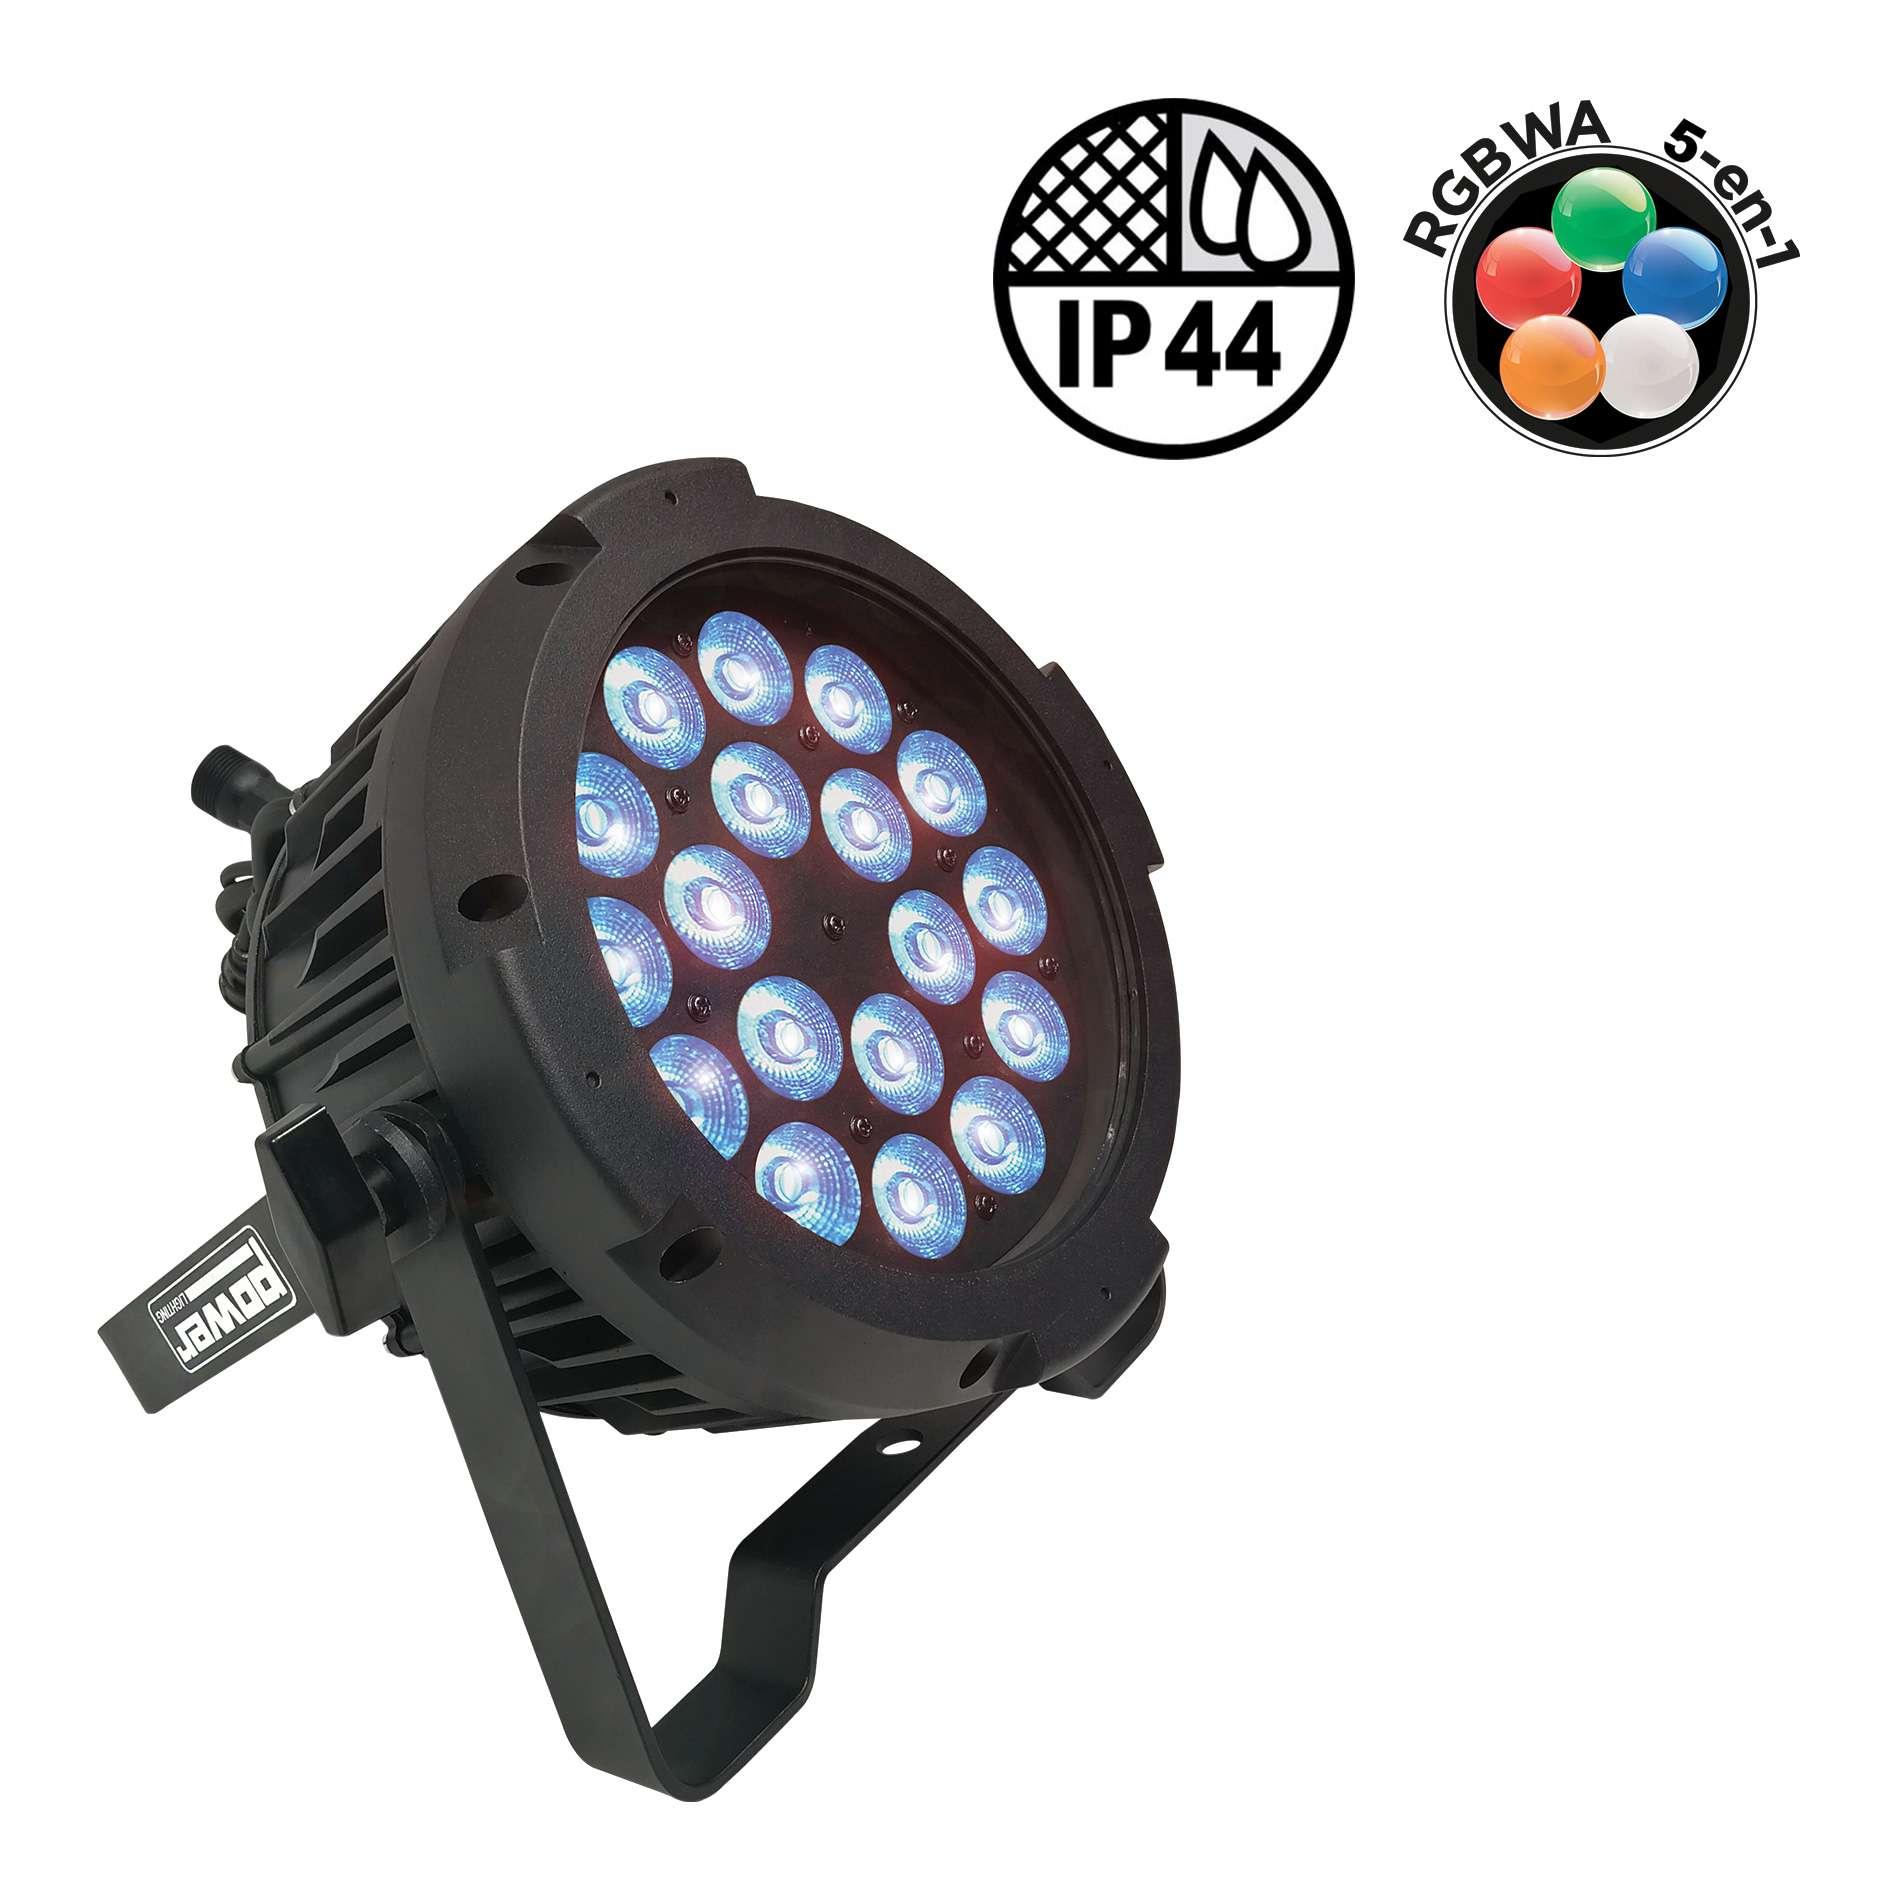 Power PAR SLIM 18x10W IP44 PENTA40